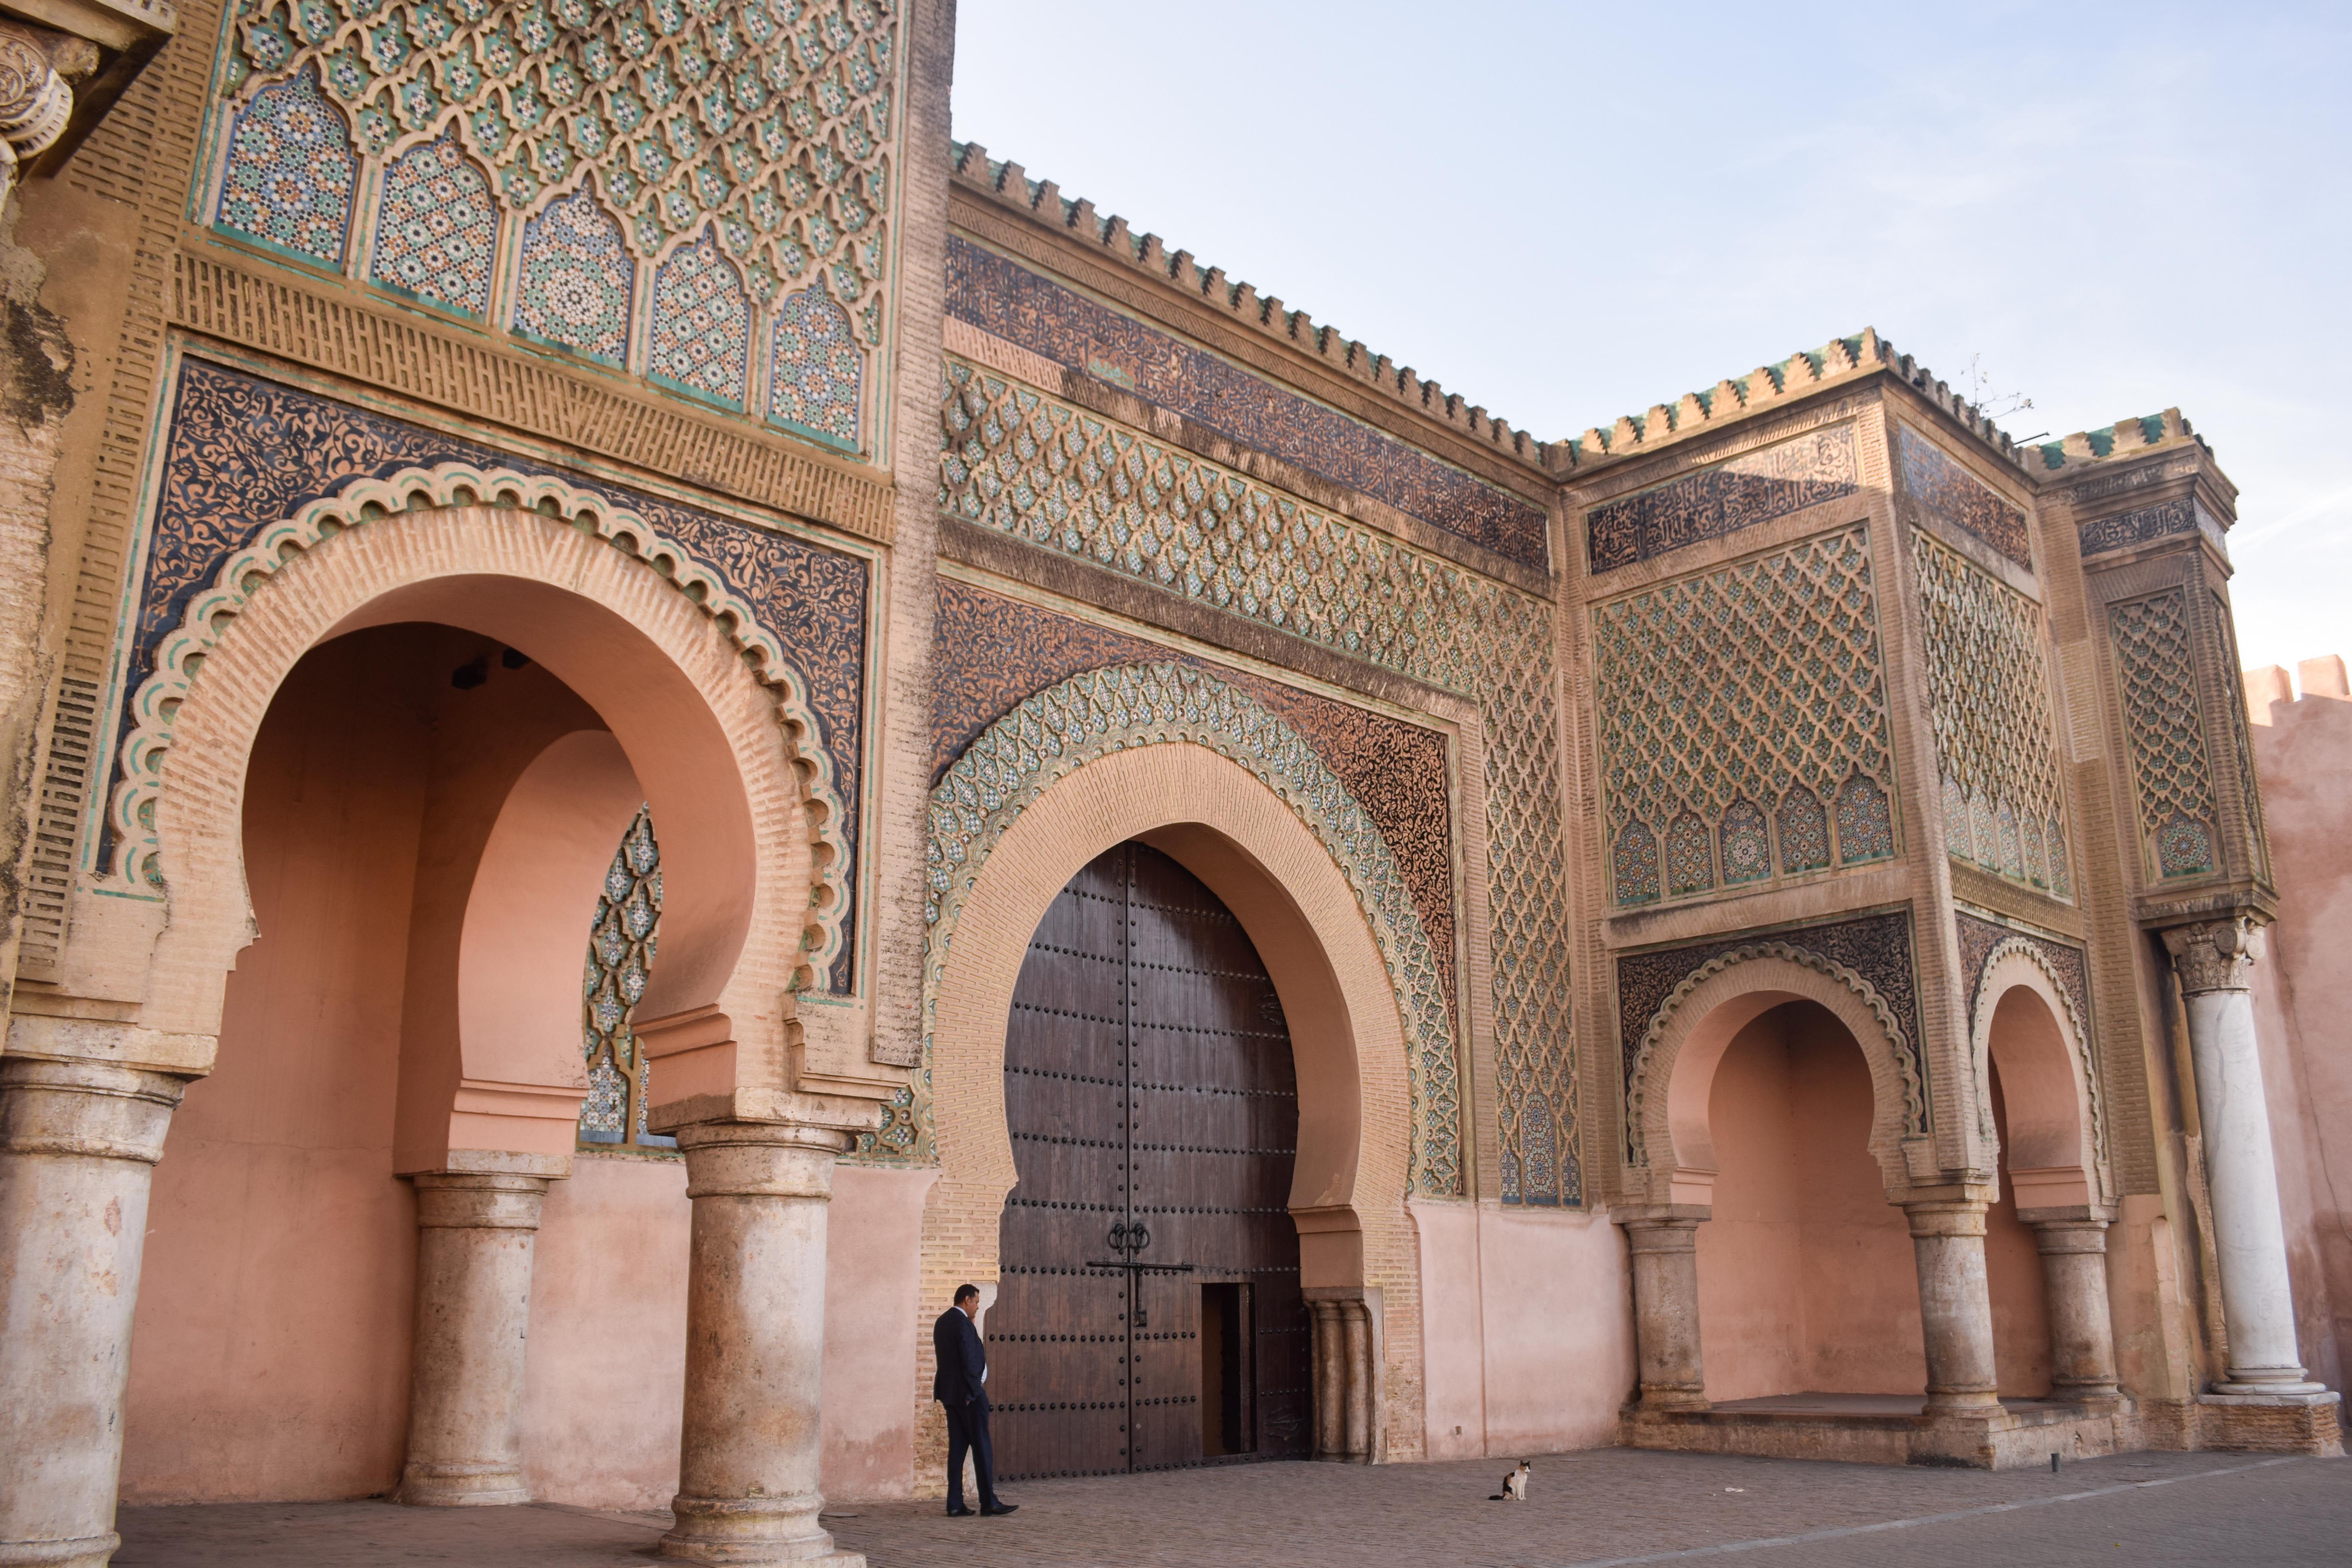 large tiled archways in Meknes